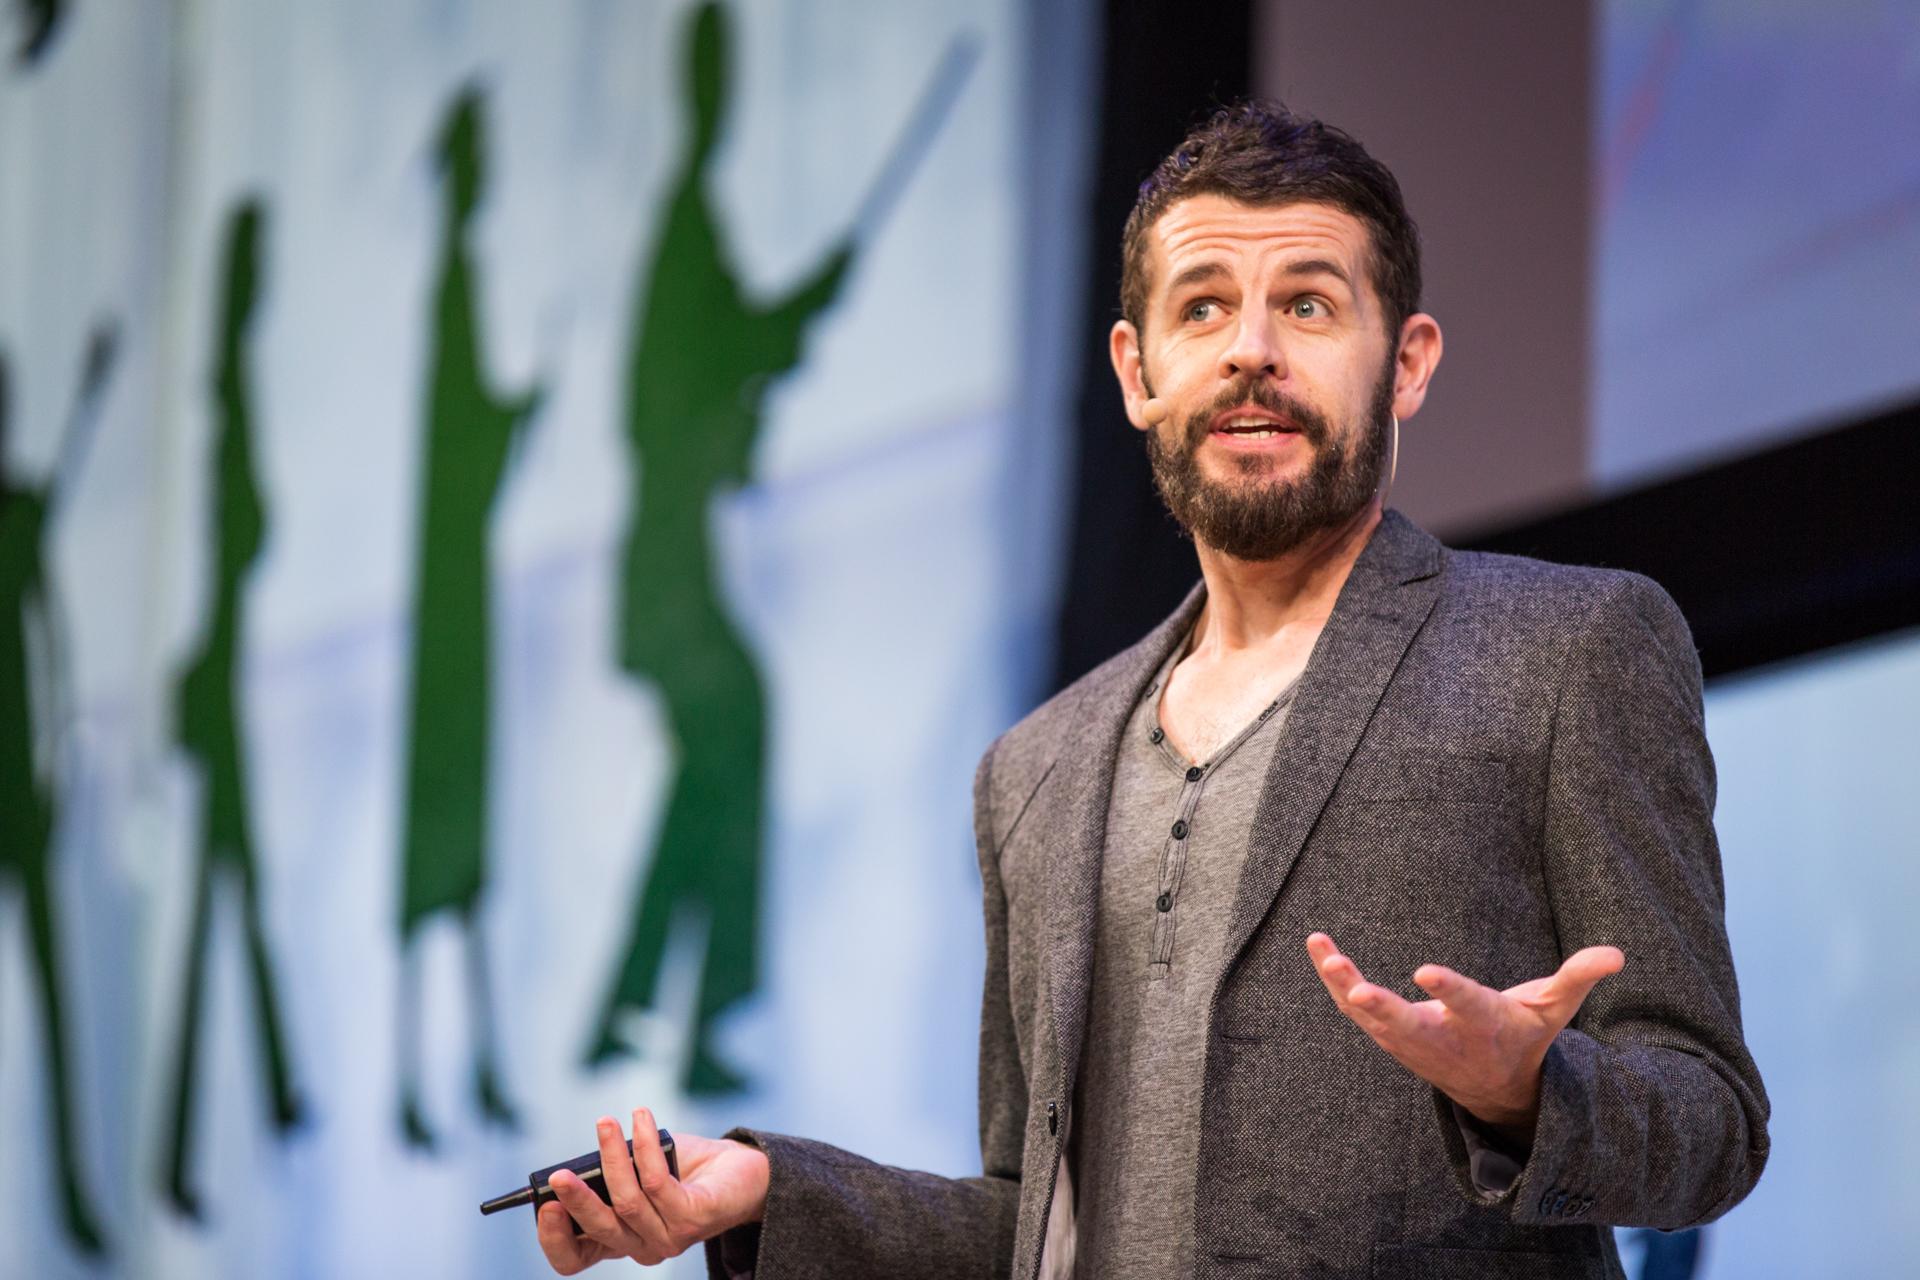 Jason Sweeney at TEDCity2.0 2013. Photo: Ryan Lash